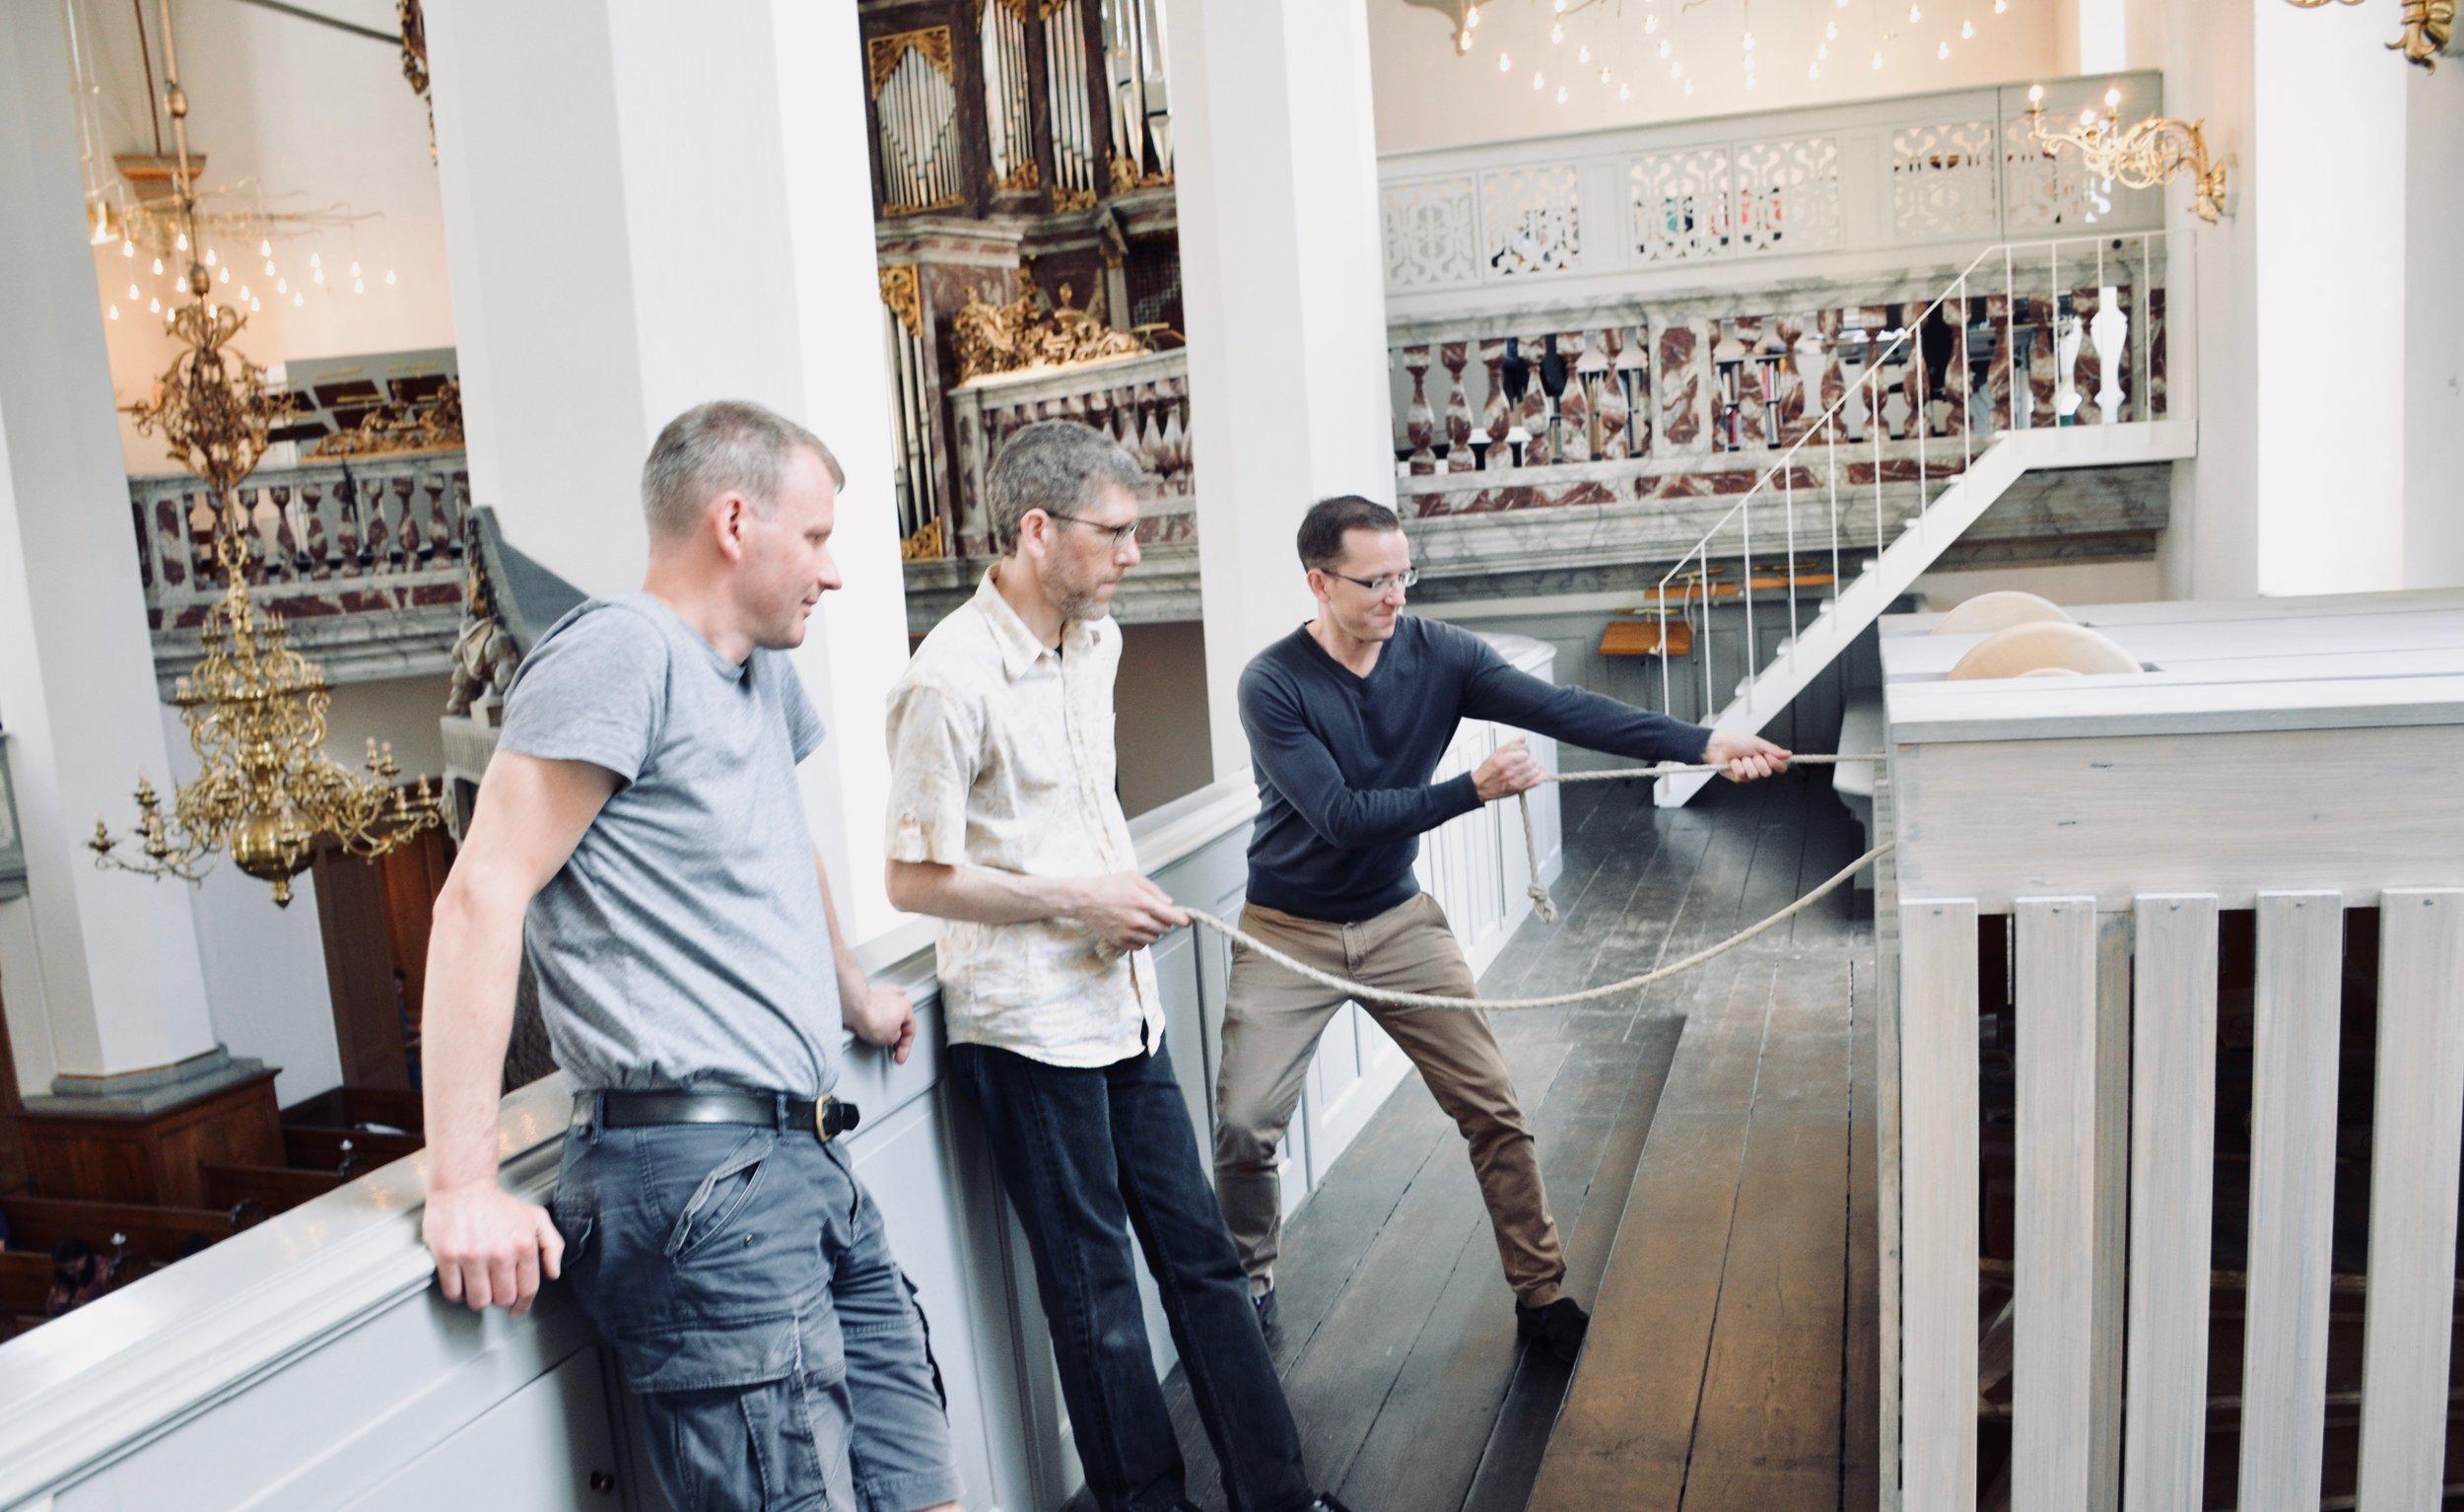 Christian Lane and Chris Porter pump the bellows for the Italian baroque organ in Trinitatis Kirke, Copenhagen.